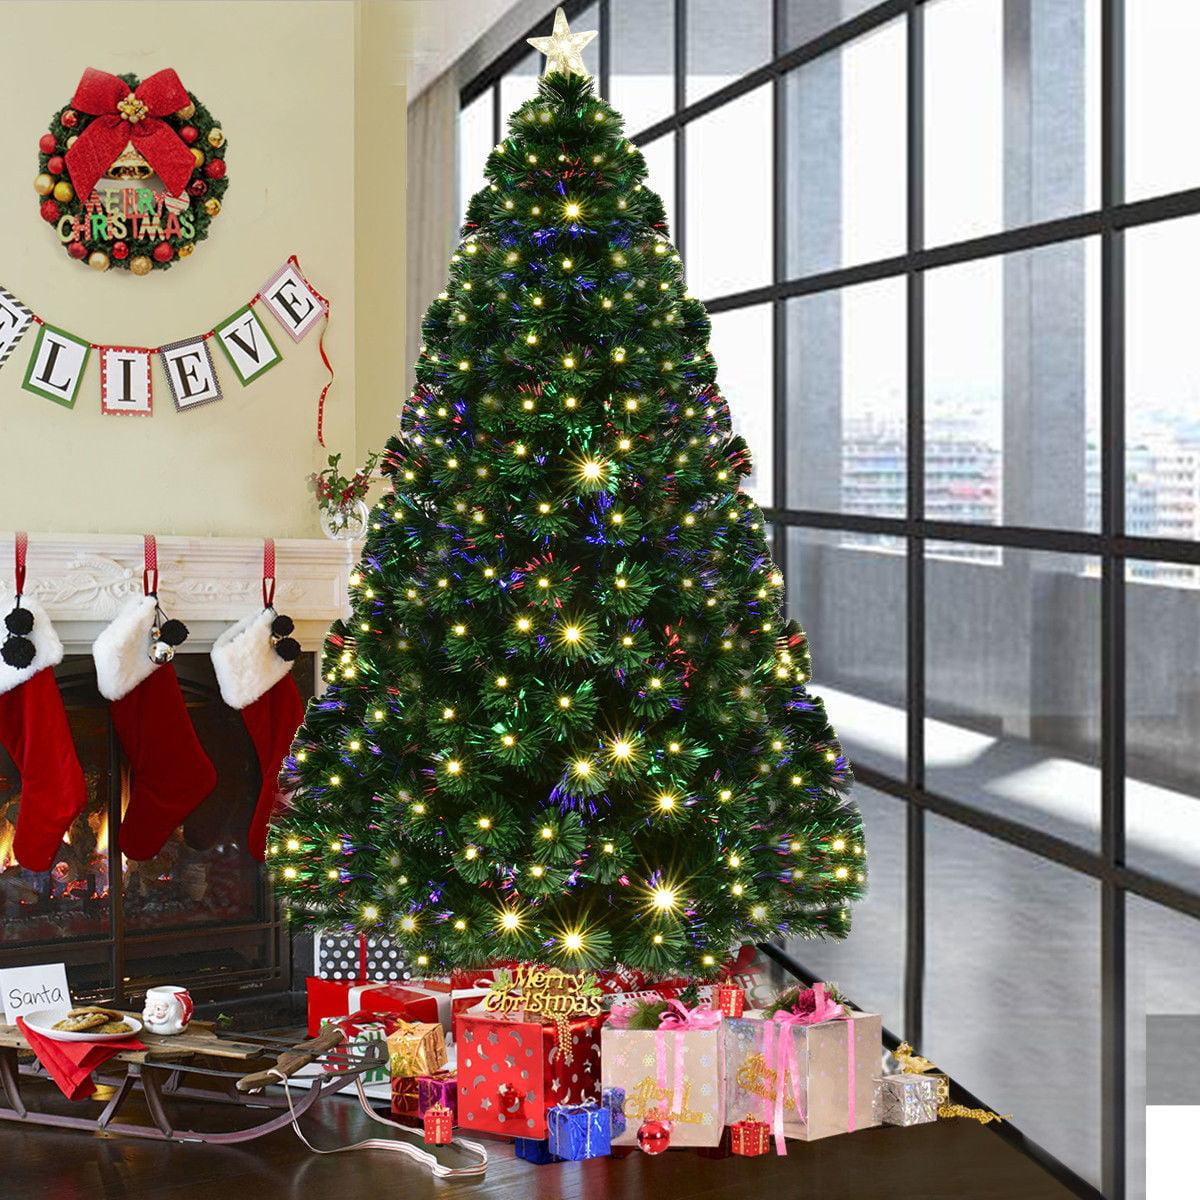 Costway 5' /6'/7'Pre-Lit Fiber Optic Artificial Christmas Tree w/ 180/230/280 LED Lights & Top Star